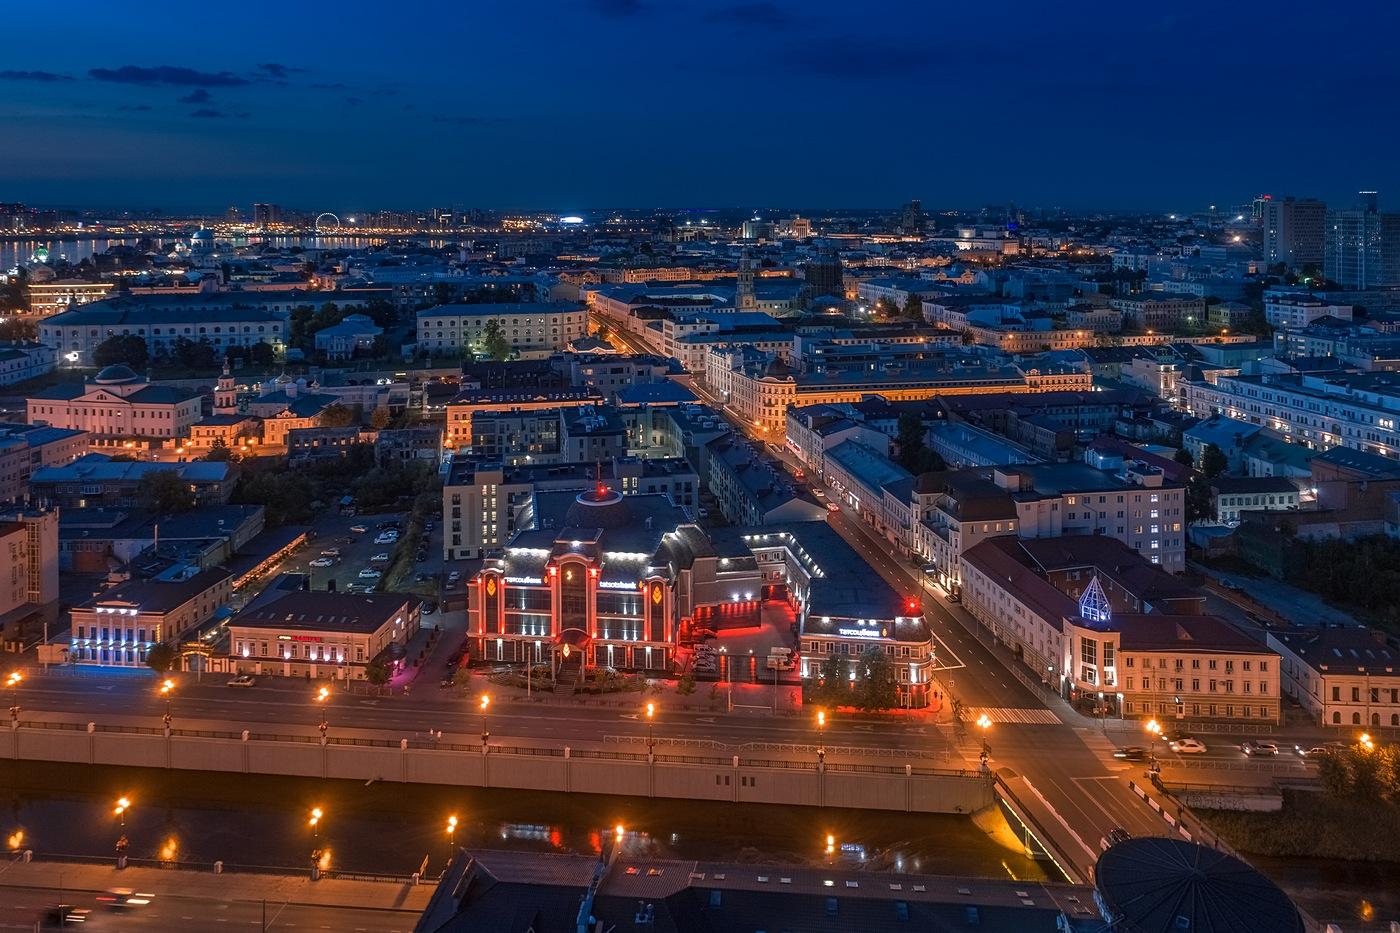 Flying Over Kazan After Sunset